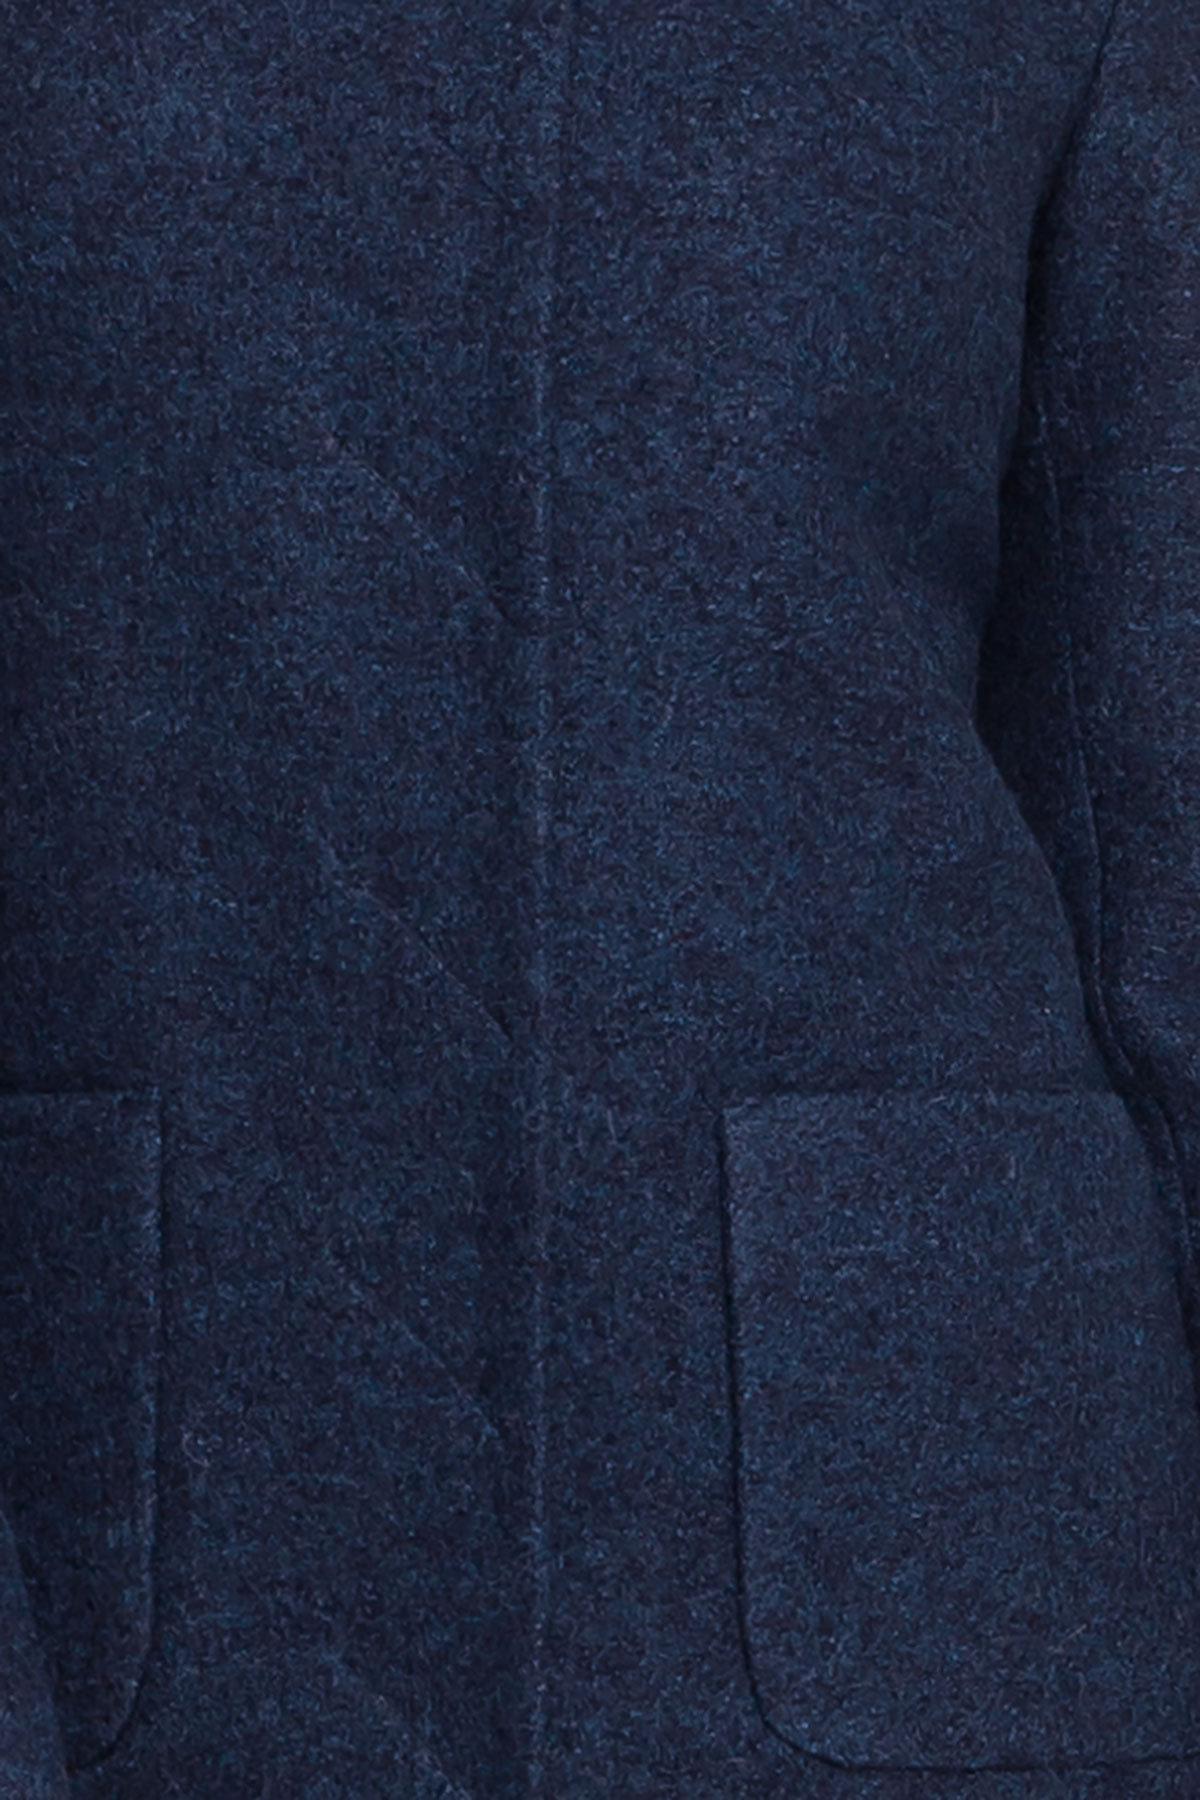 Пальто Мелини 4433 Цвет: Мурена LW18